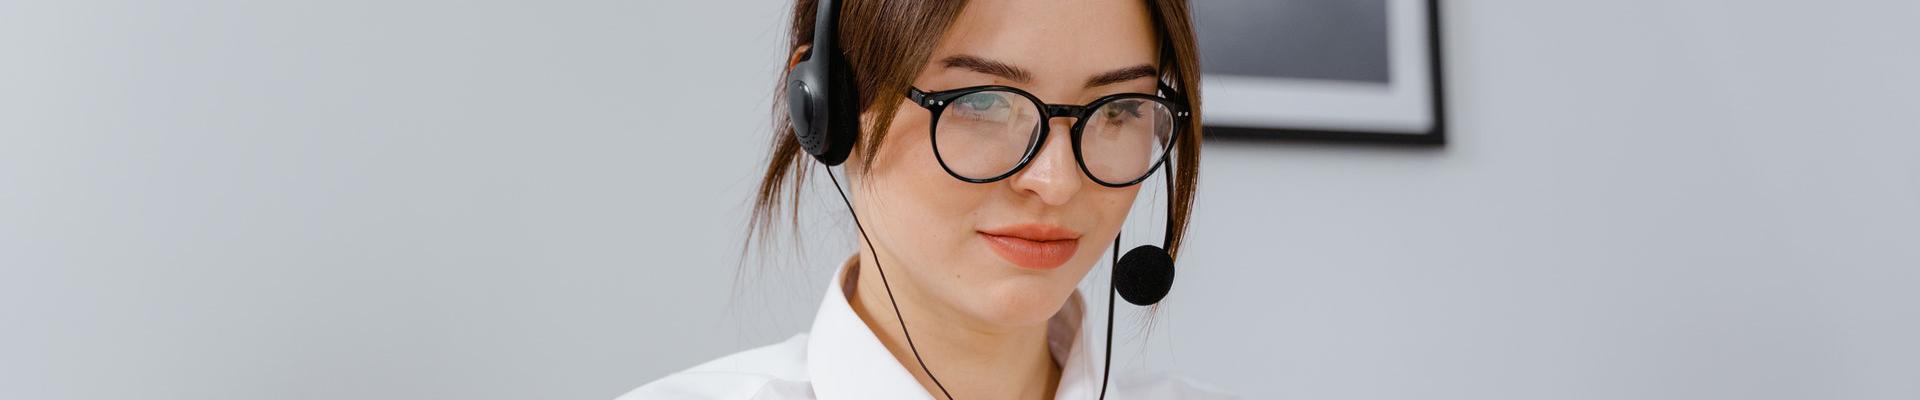 Lambert Kunden Service